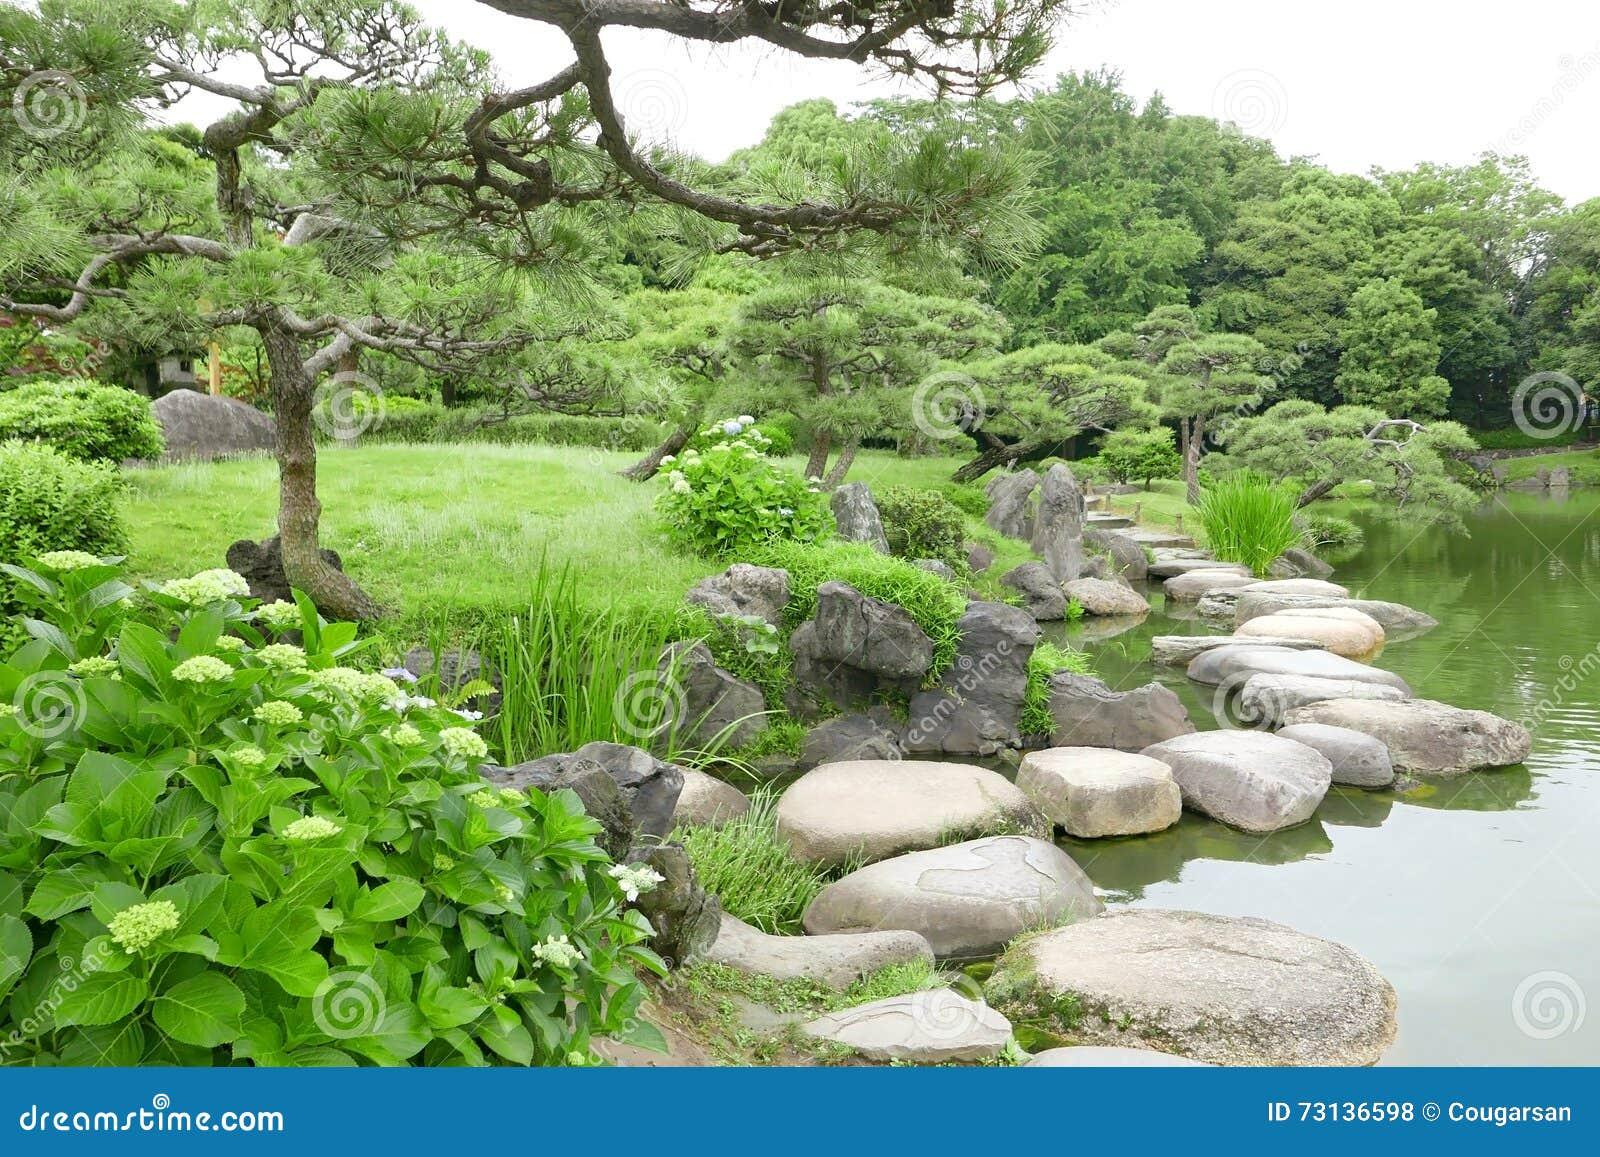 Japanese zen gardens with pond - Grasses Stone Bridge And Water Pond In Japanese Zen Garden Royalty Free Stock Photos